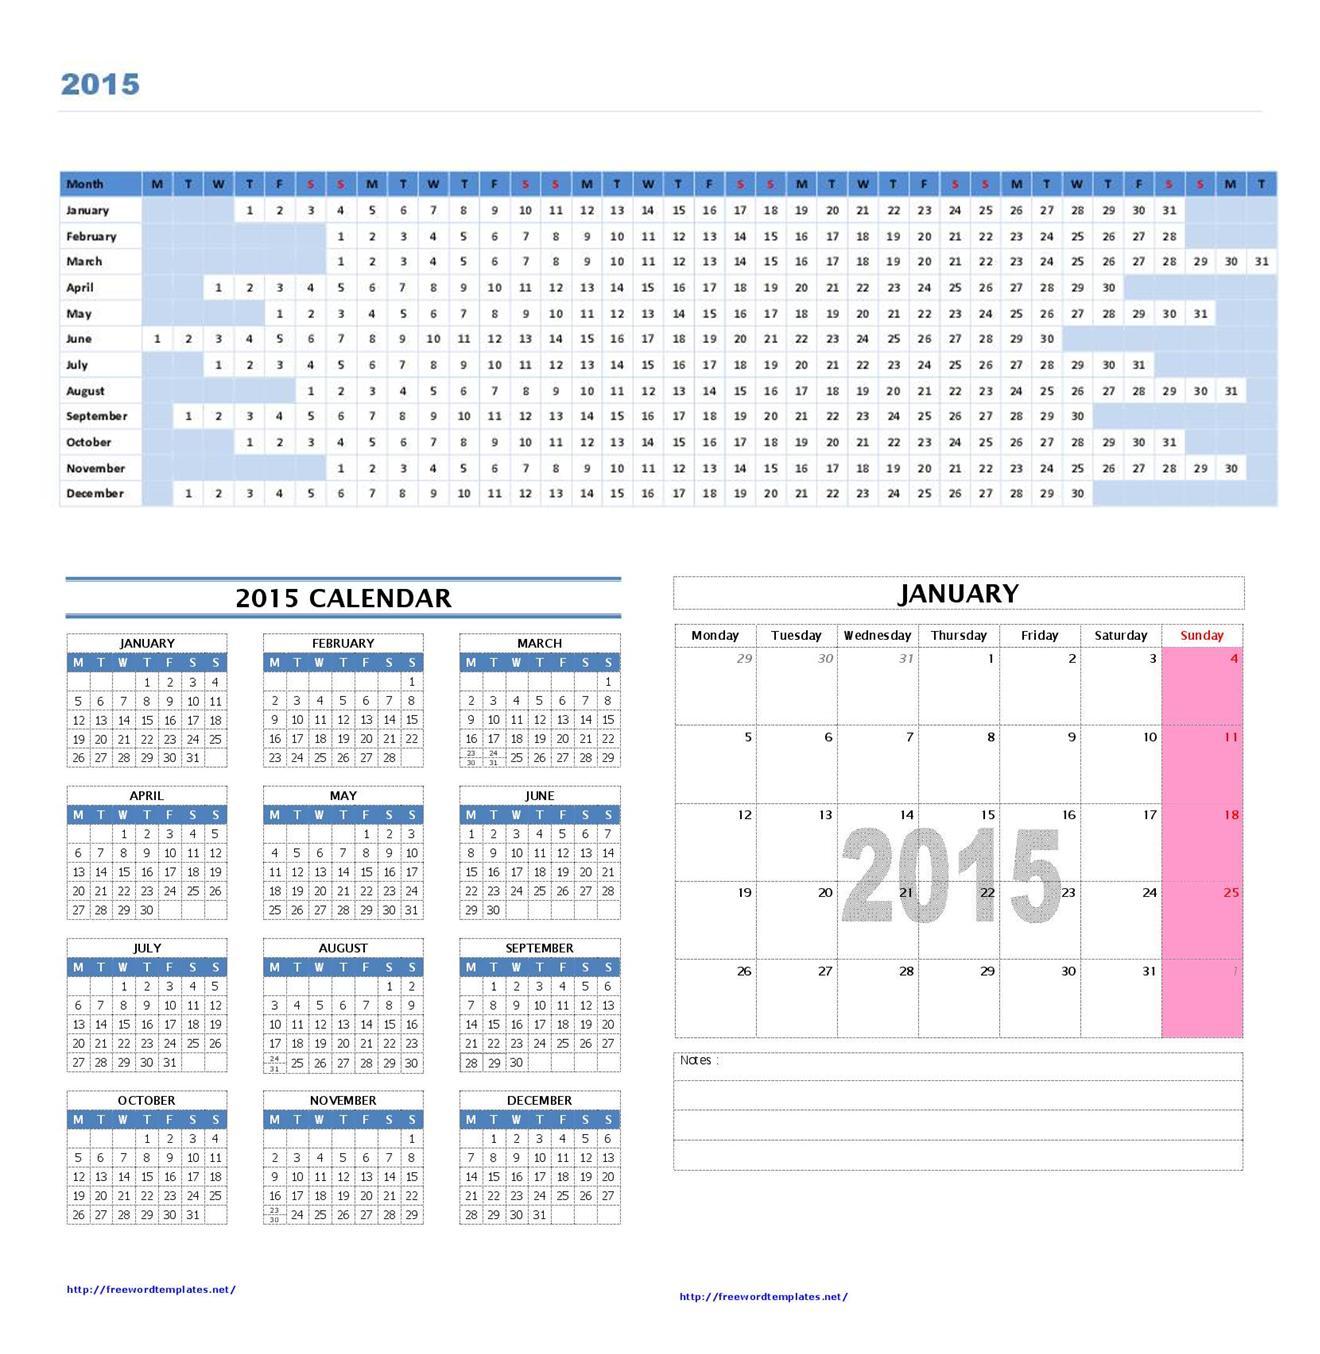 Calendar Design Ms Word : Microsoft blank calendar template images